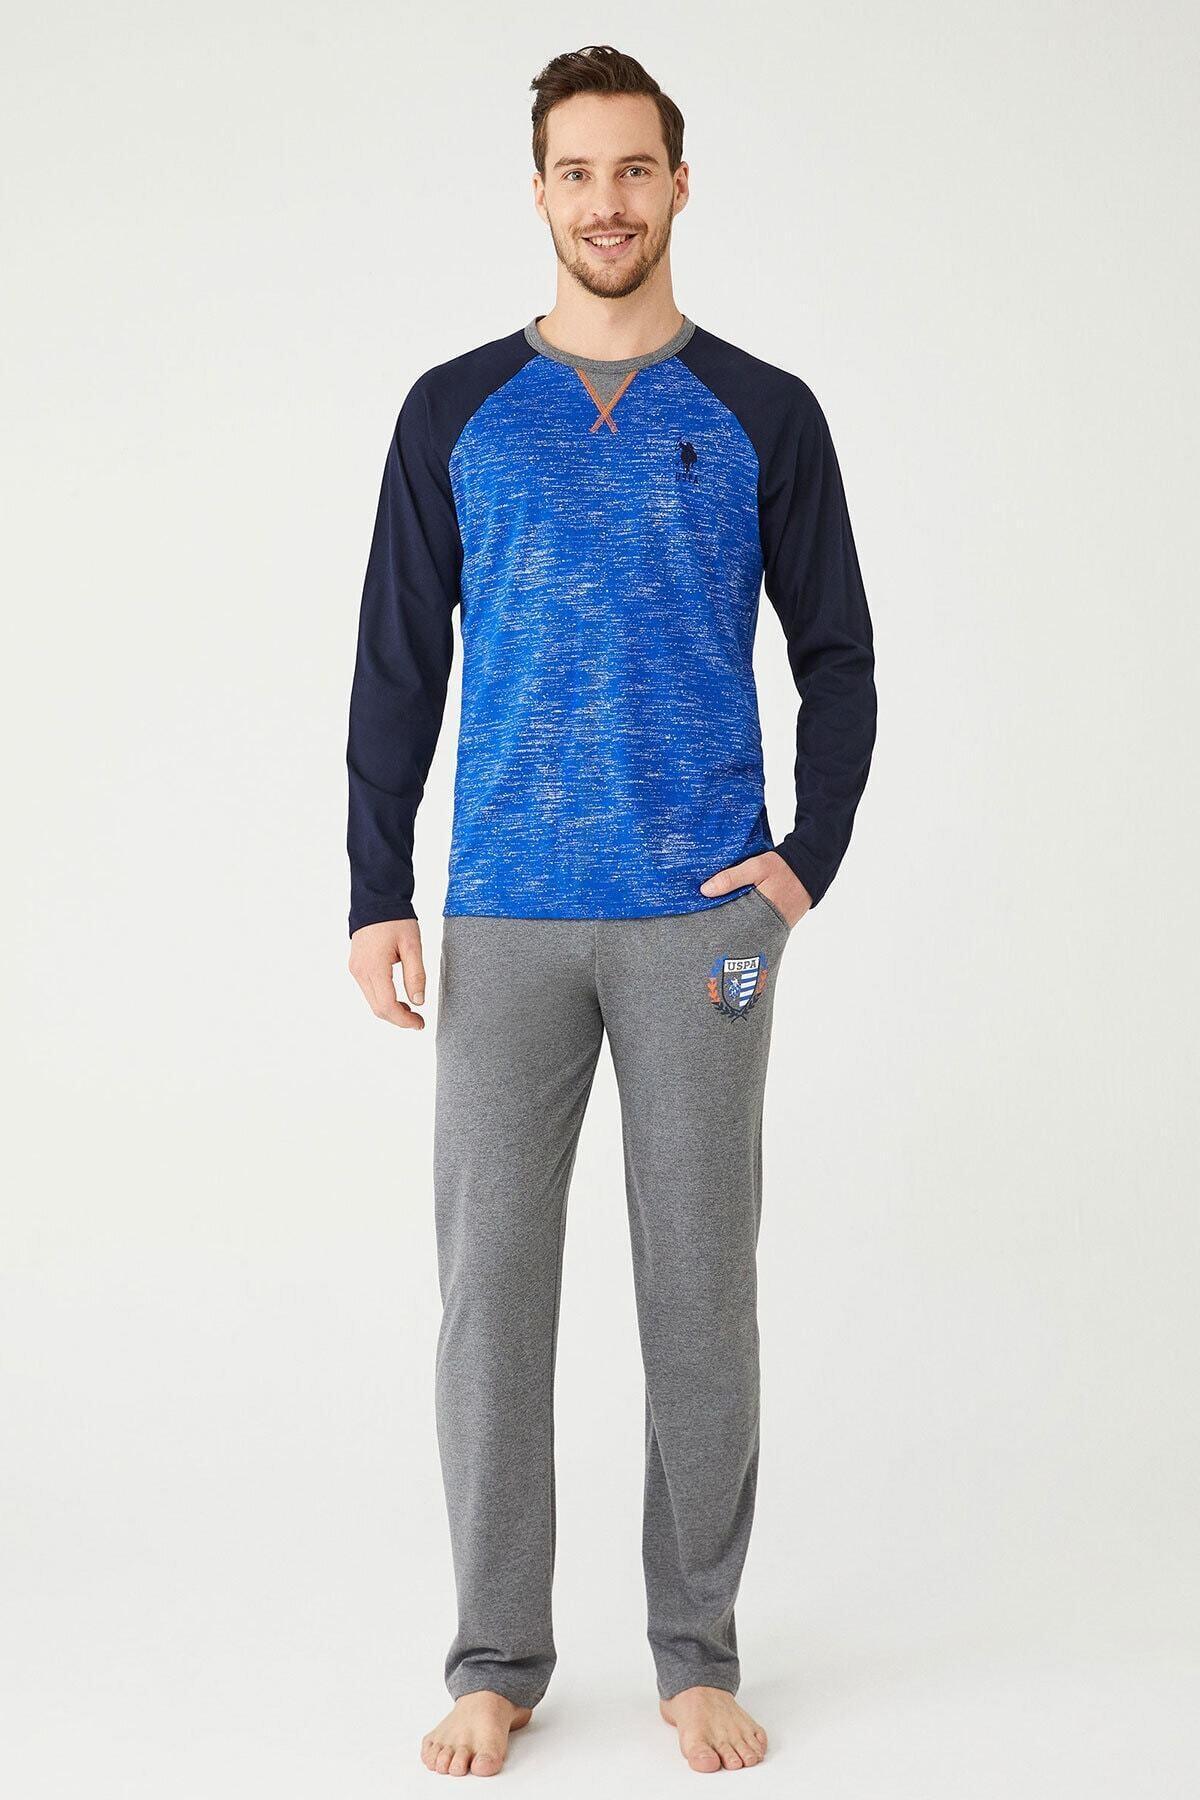 U.S POLO Erkek Sax Yuvarlak Yaka Pijama Takım 1